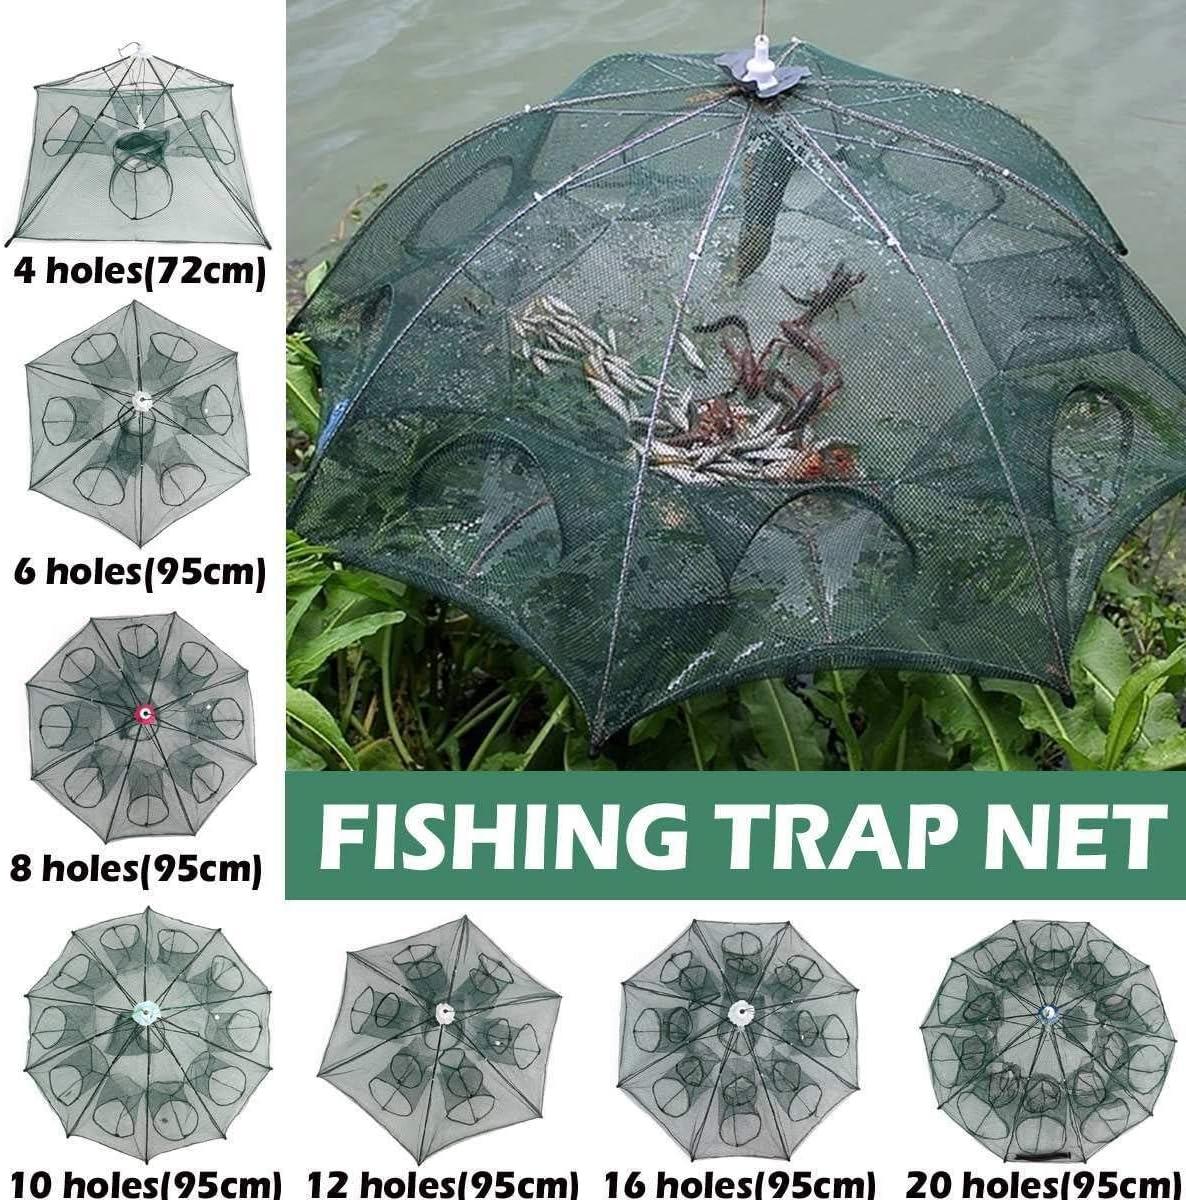 Details about  /4//6//8//10//20 Holes Automatic Folded Fishing Net Fish Shrimp Minnow Crayfish Crab